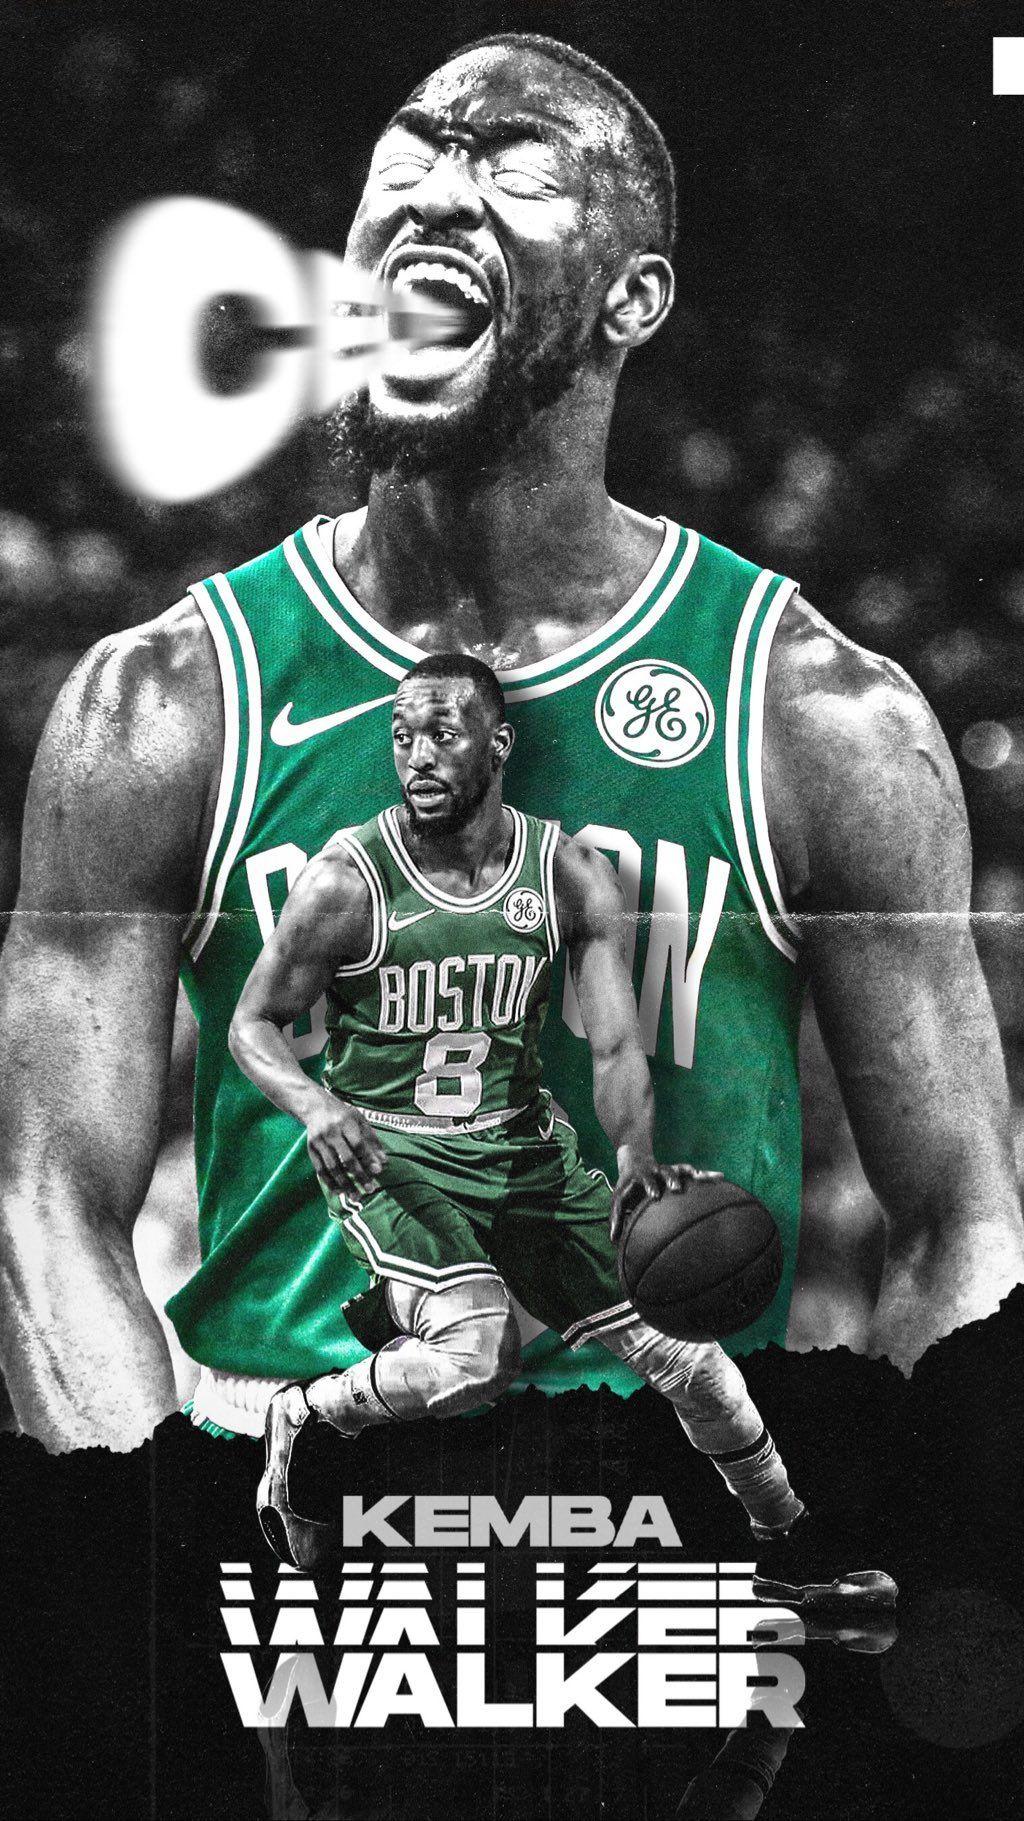 Cerita Instagram In 2020 Nba Basketball Art Nba Artwork Nba Pictures